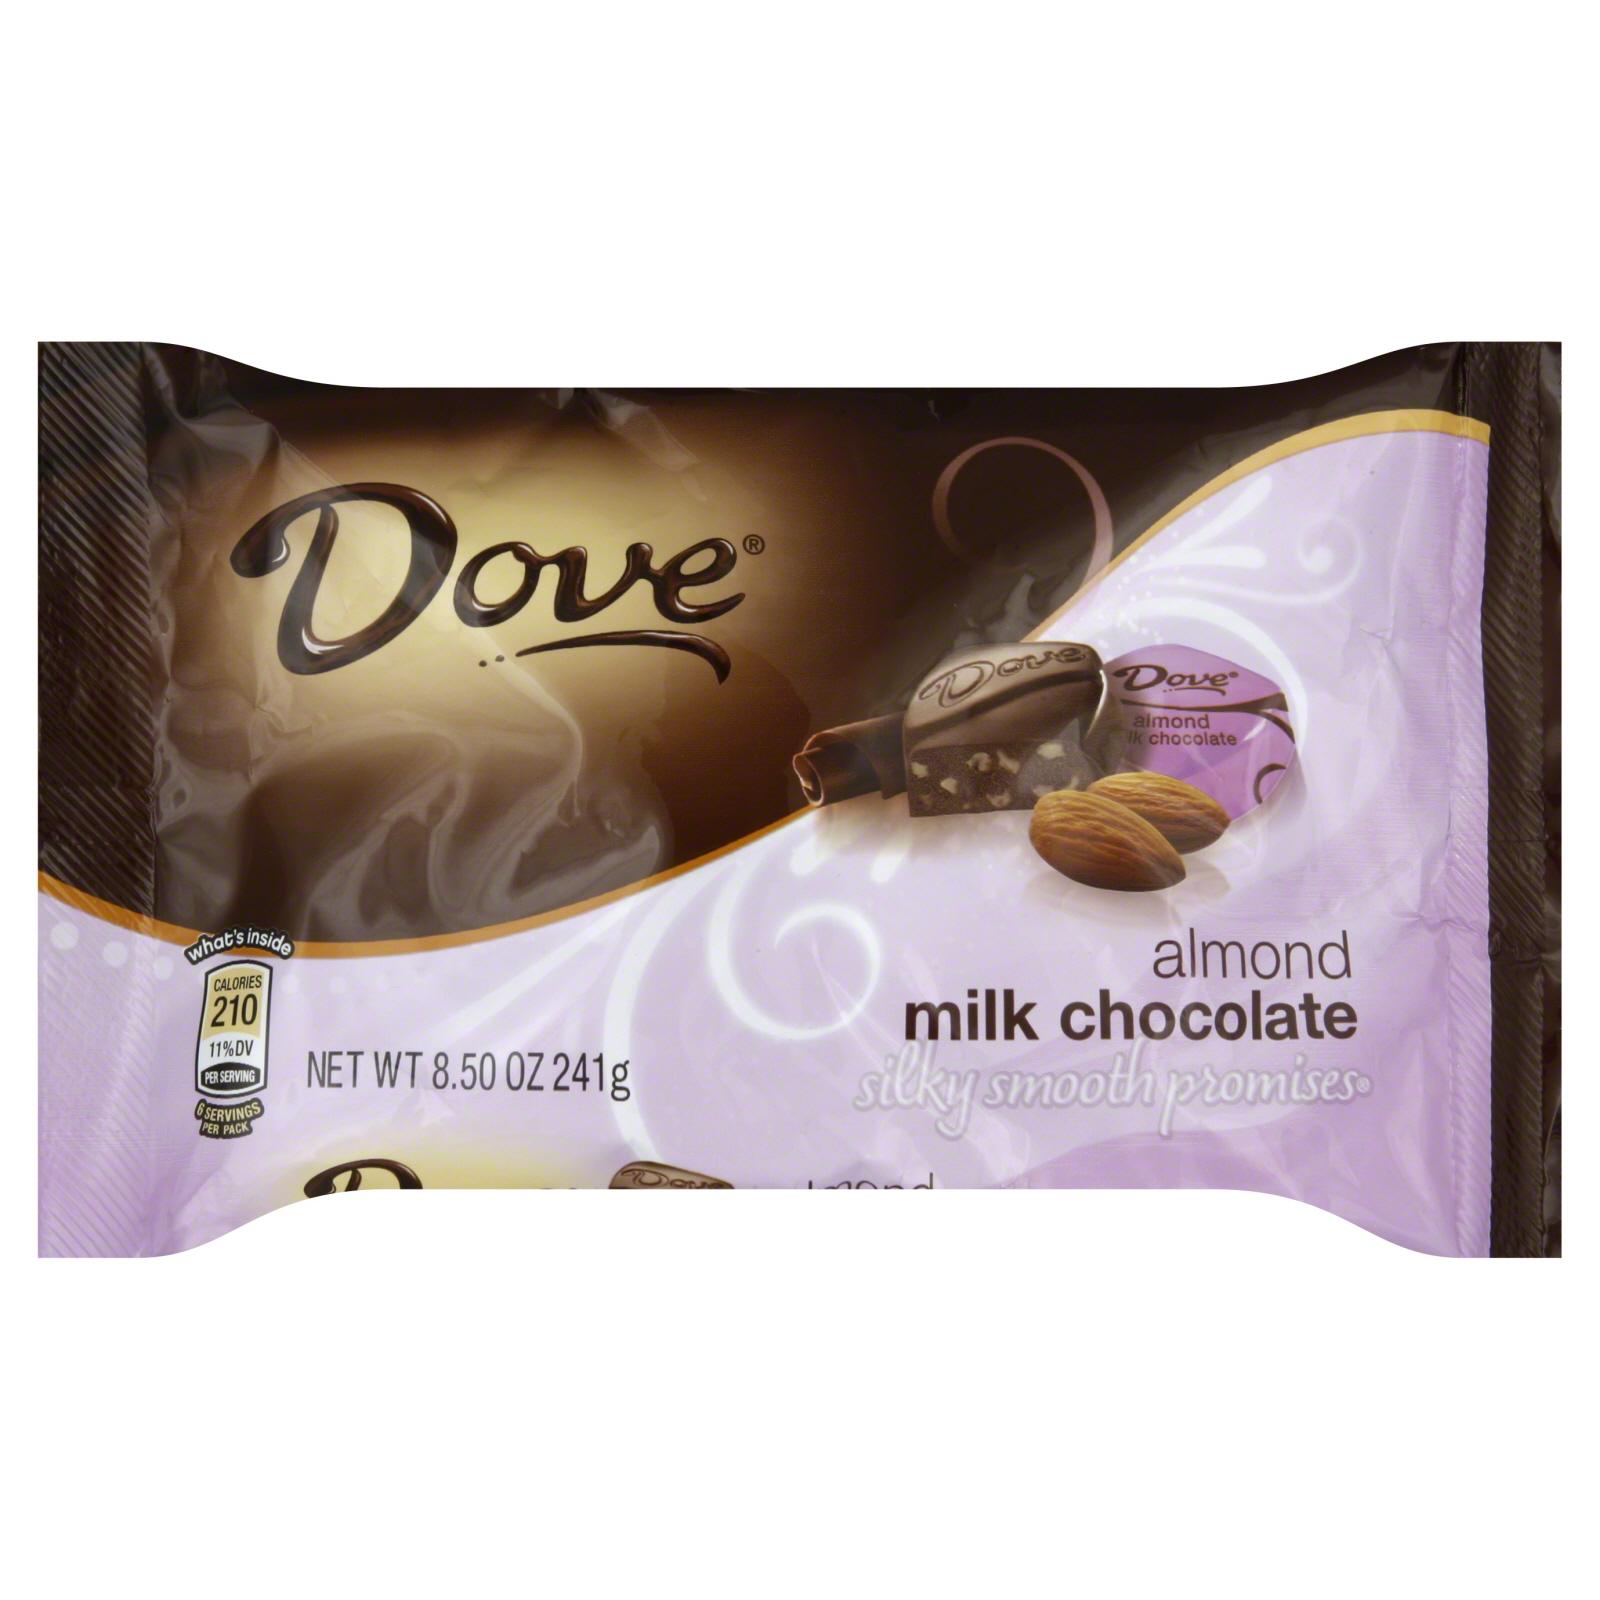 Dove Smooth Milk Chocolate With Almonds 85 Oz 241 G